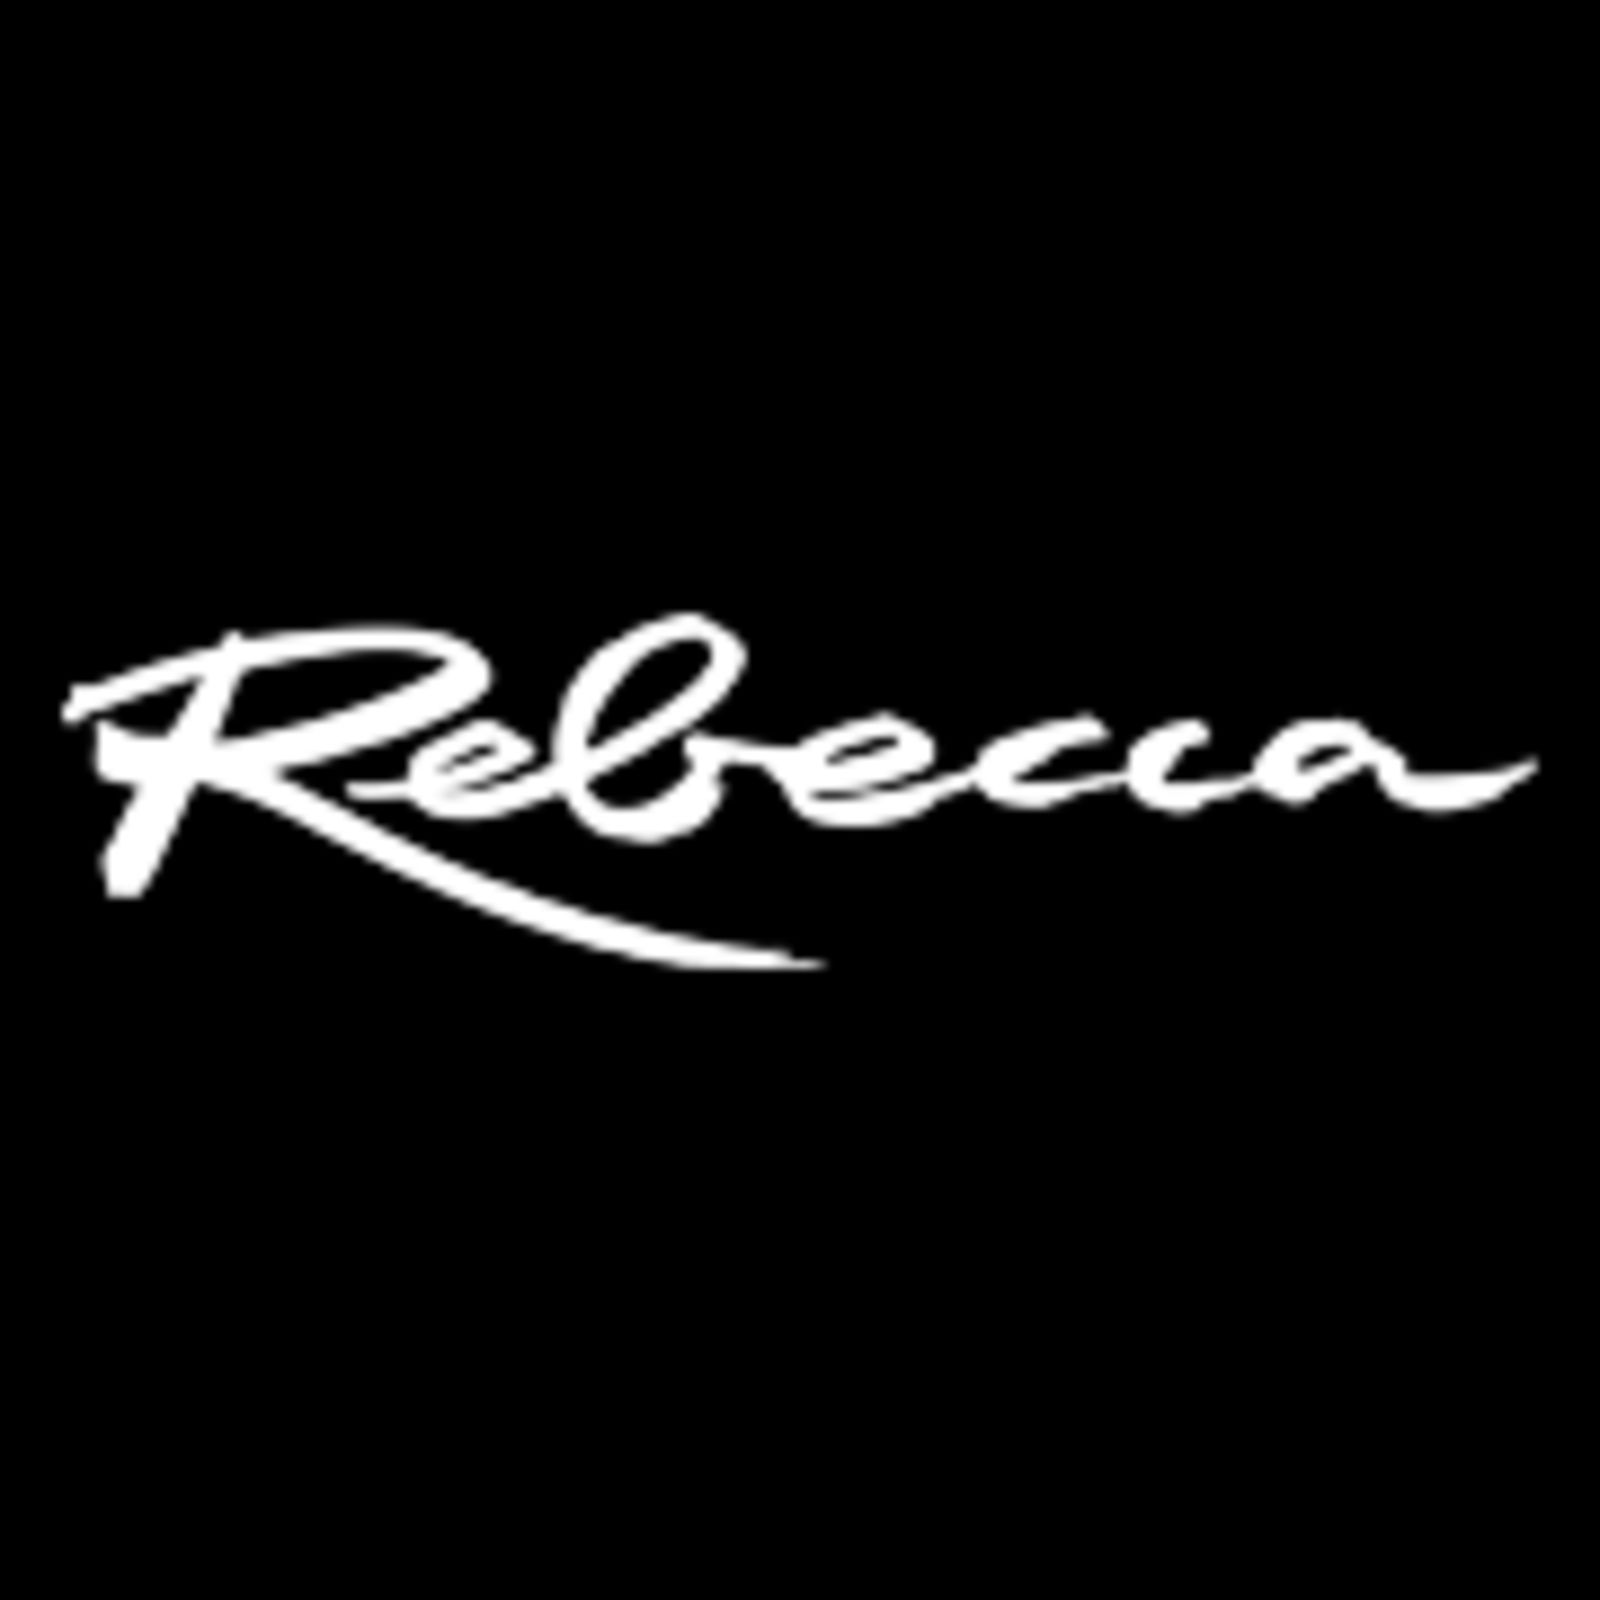 REBECCA Concept Store in Berlin (Bild 1)